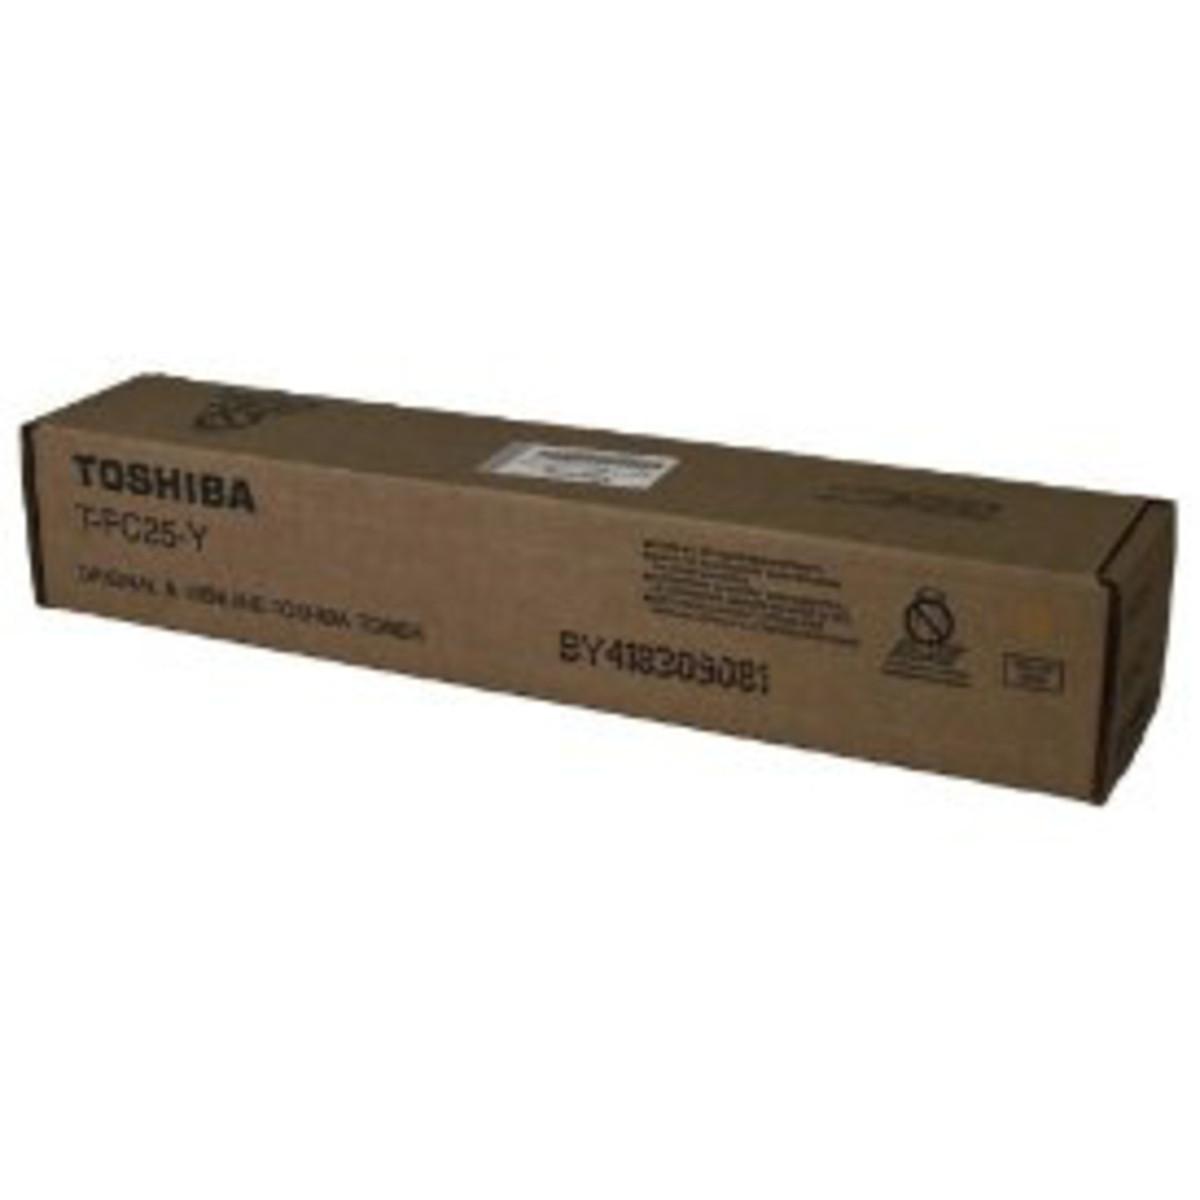 Toshiba TFC25Y Yellow Toner Cartridge